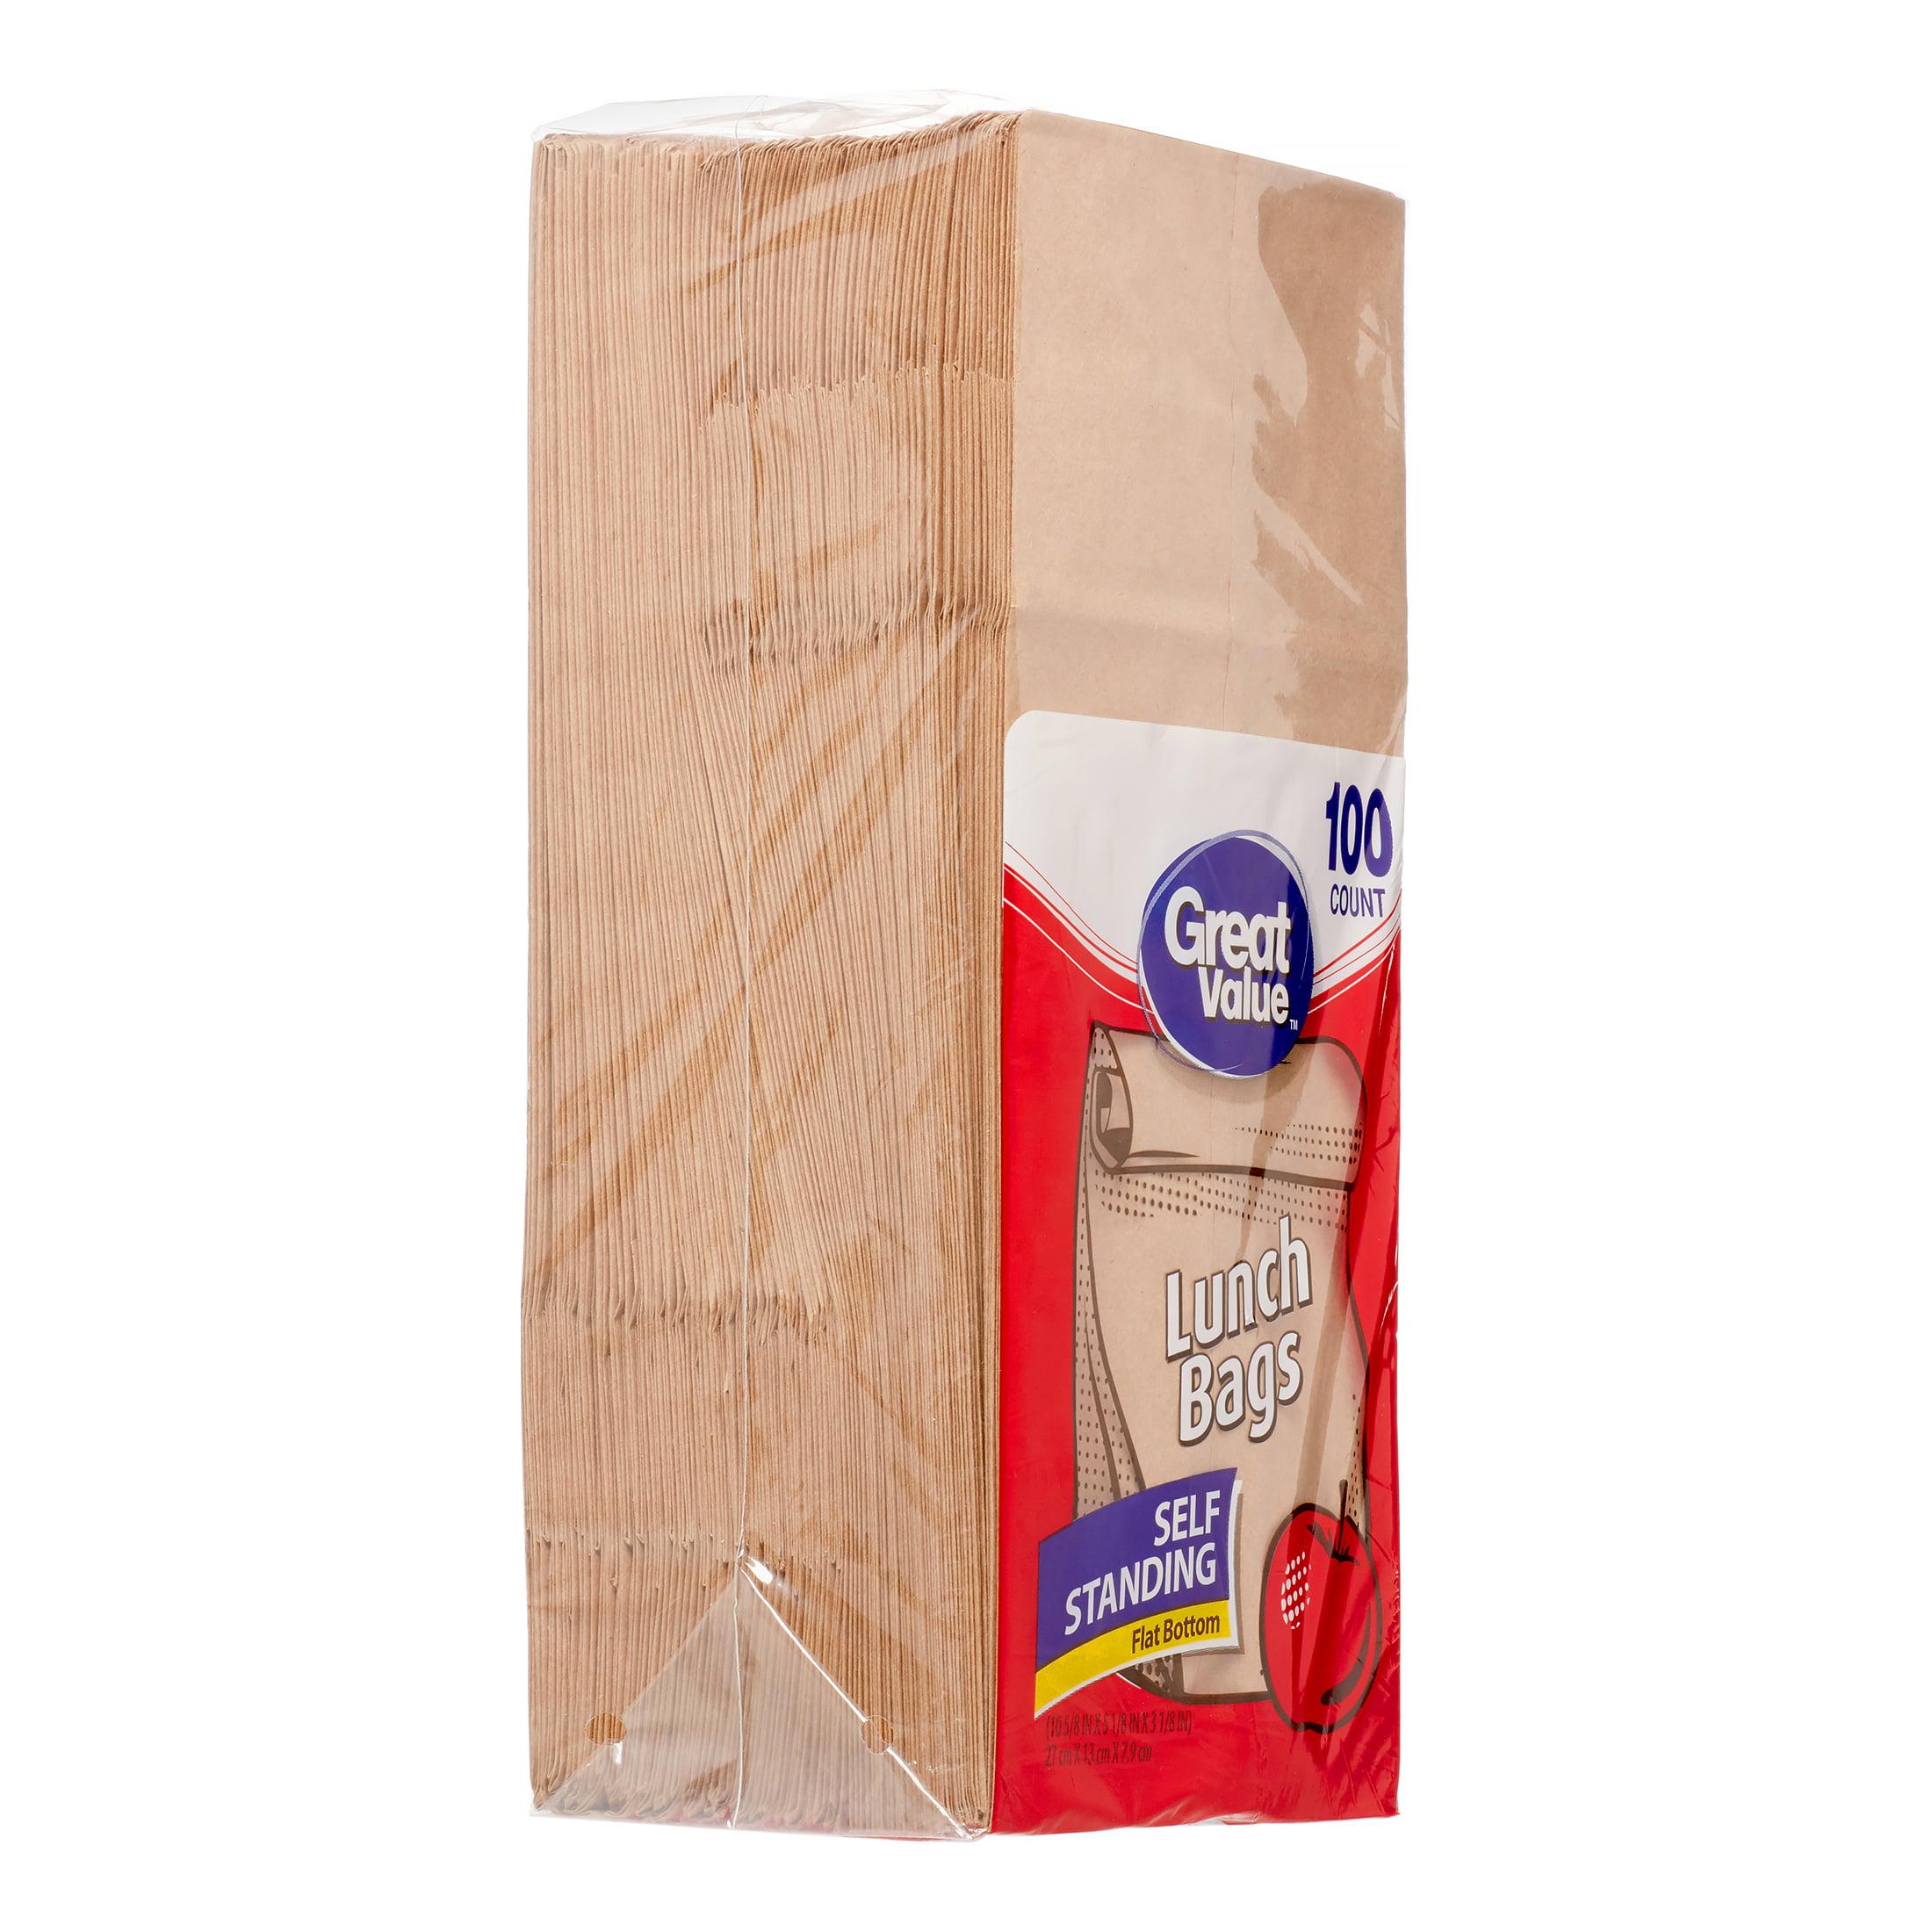 Paper bag floor youtube - Paper Bag Floor Youtube 44